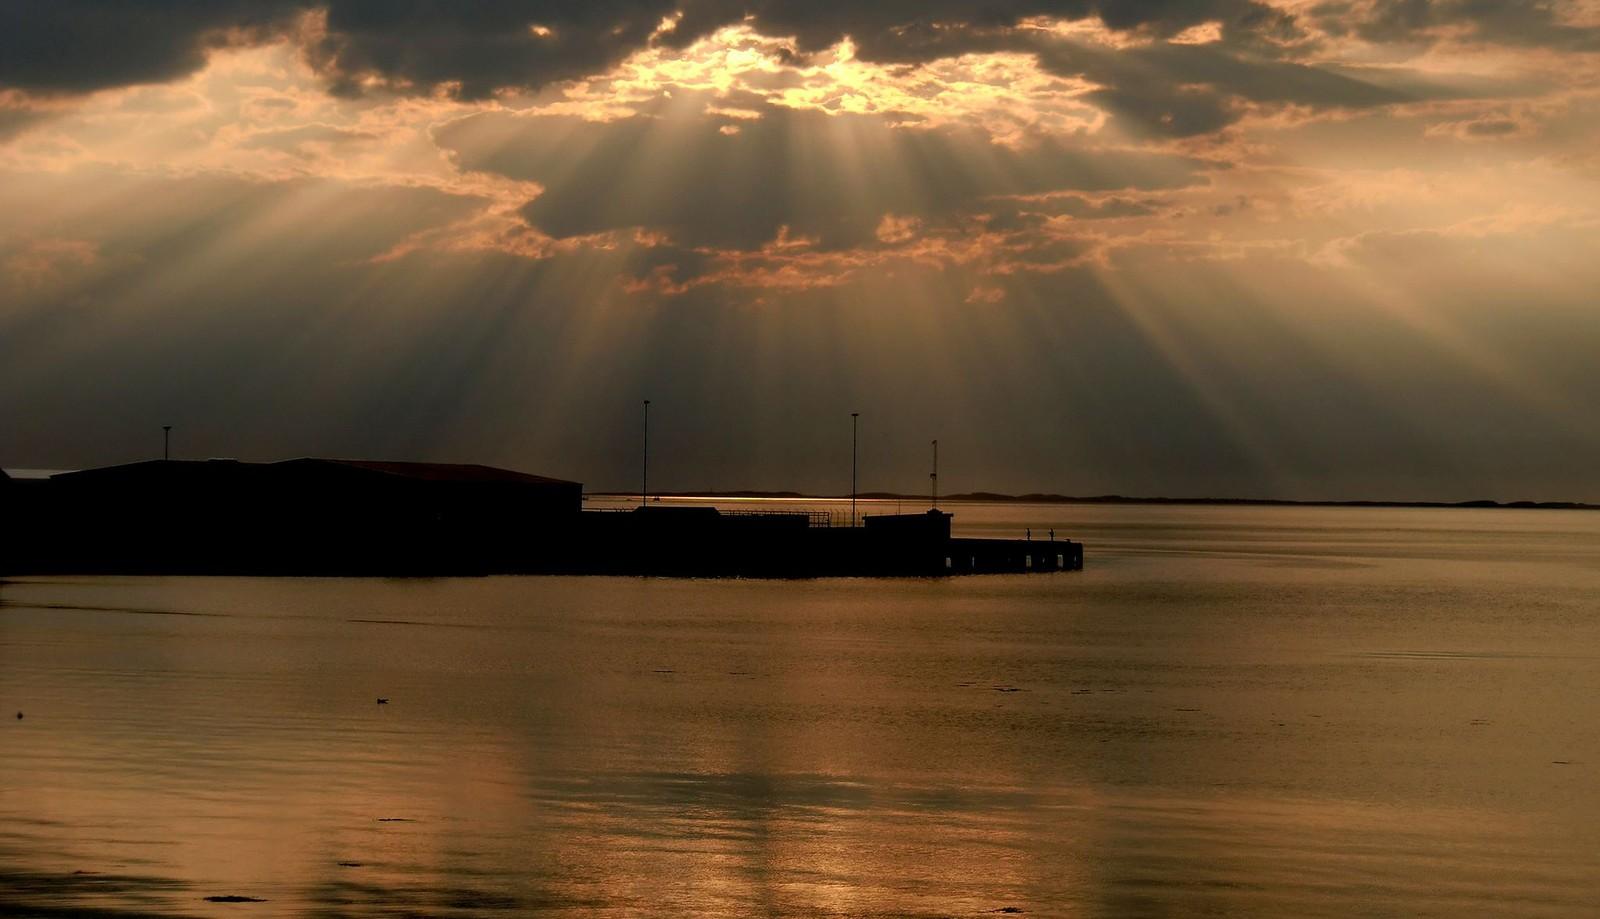 Solnedgang over Uthaug